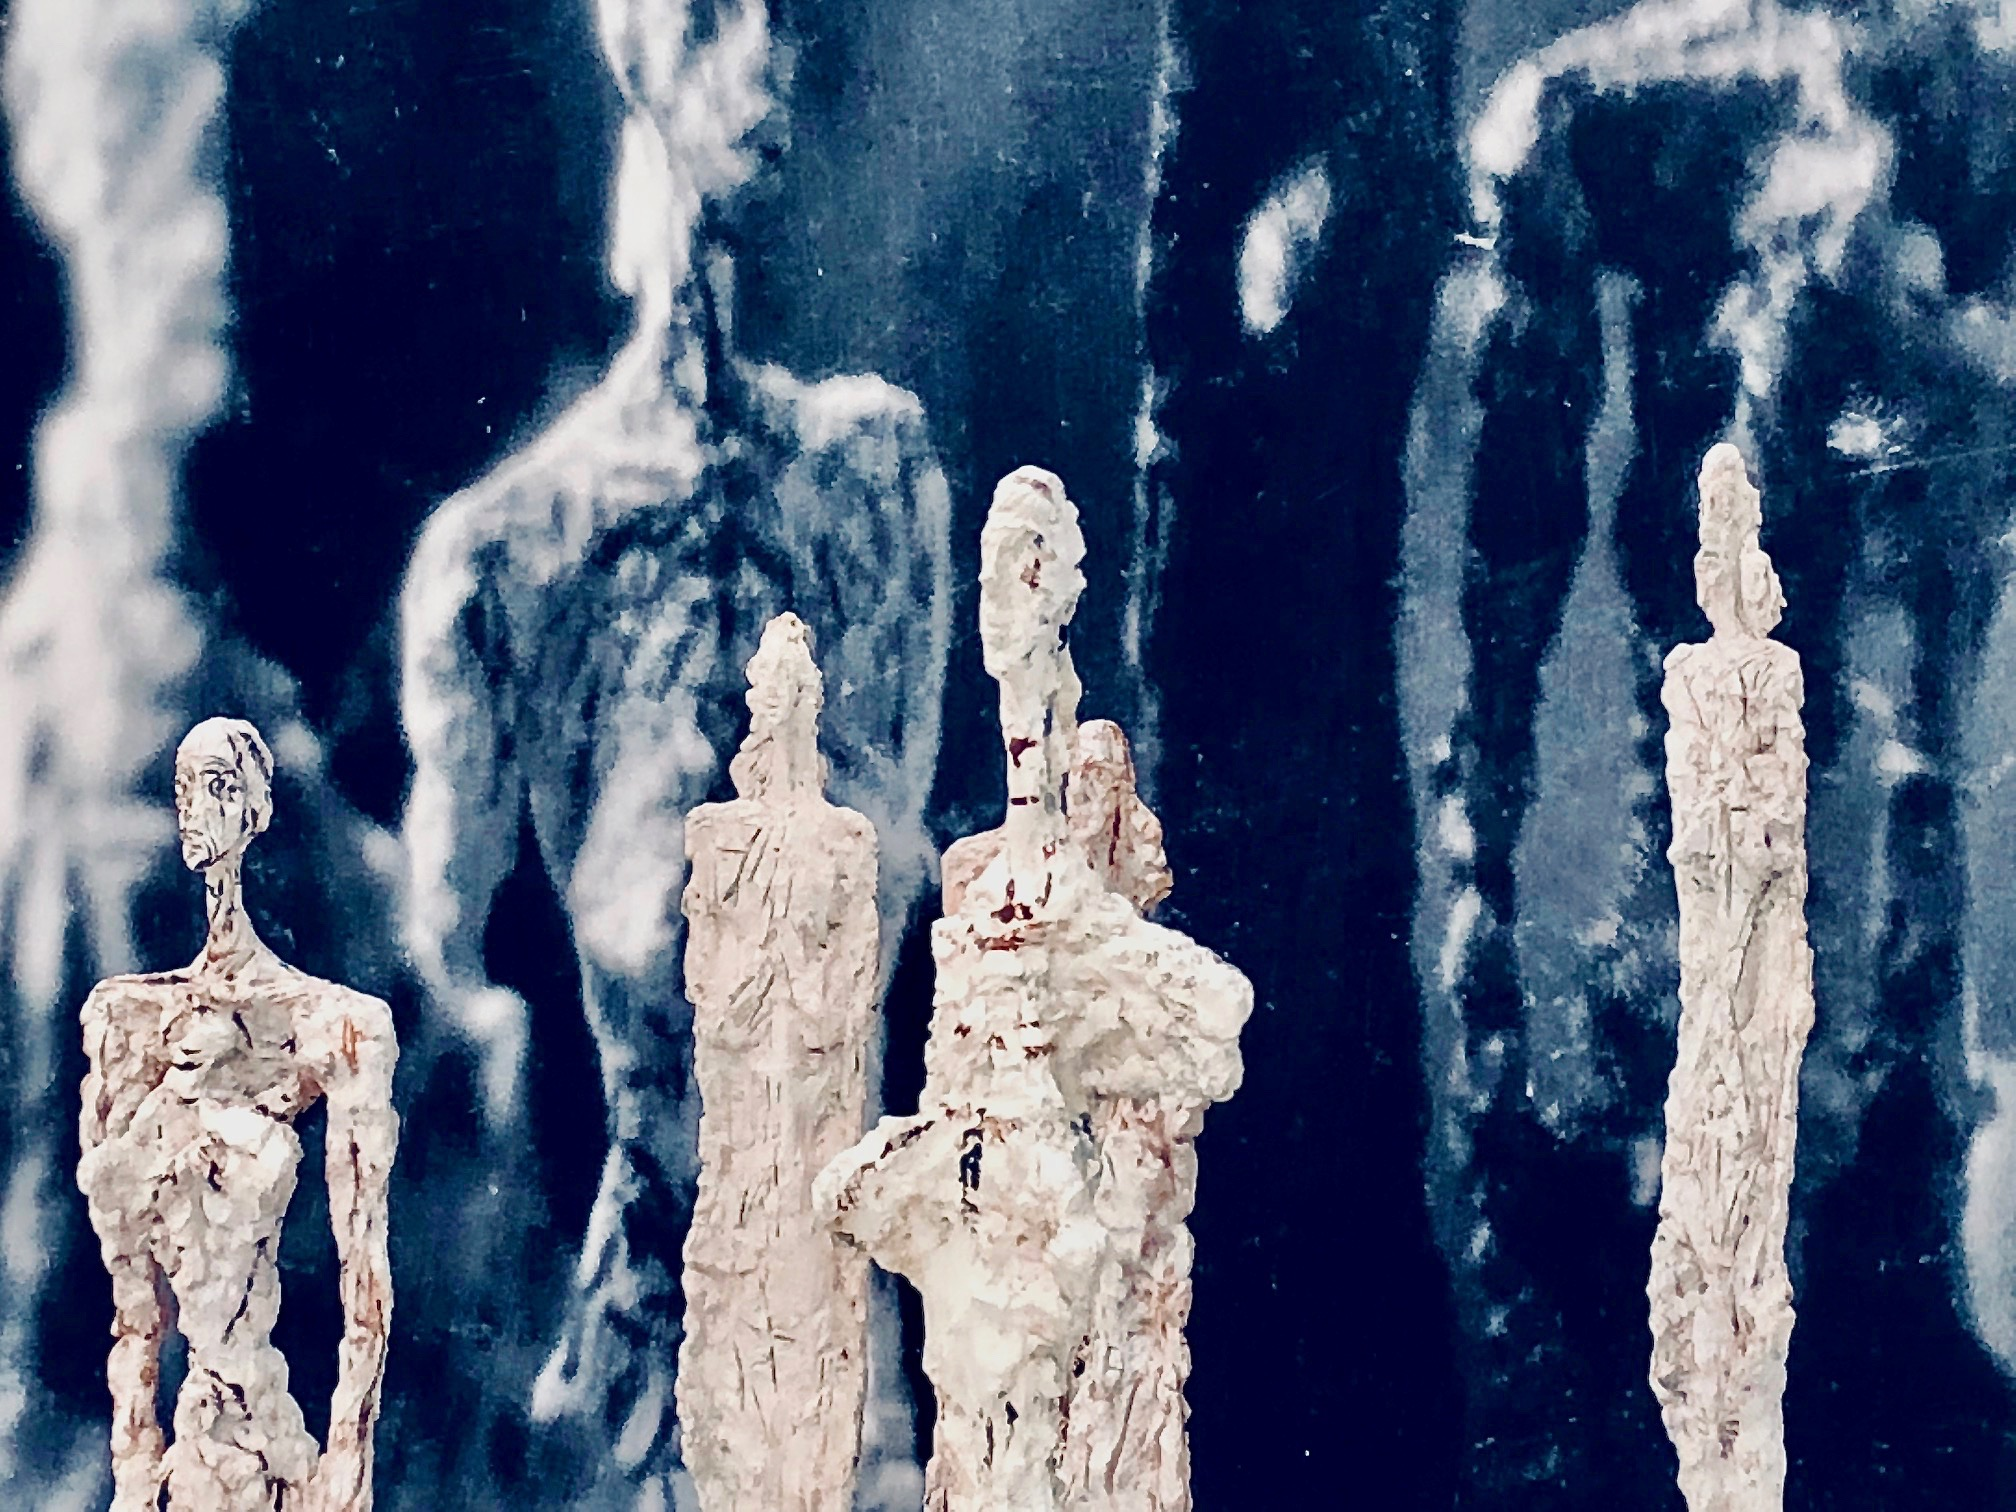 Foundation Giacometti at Paris